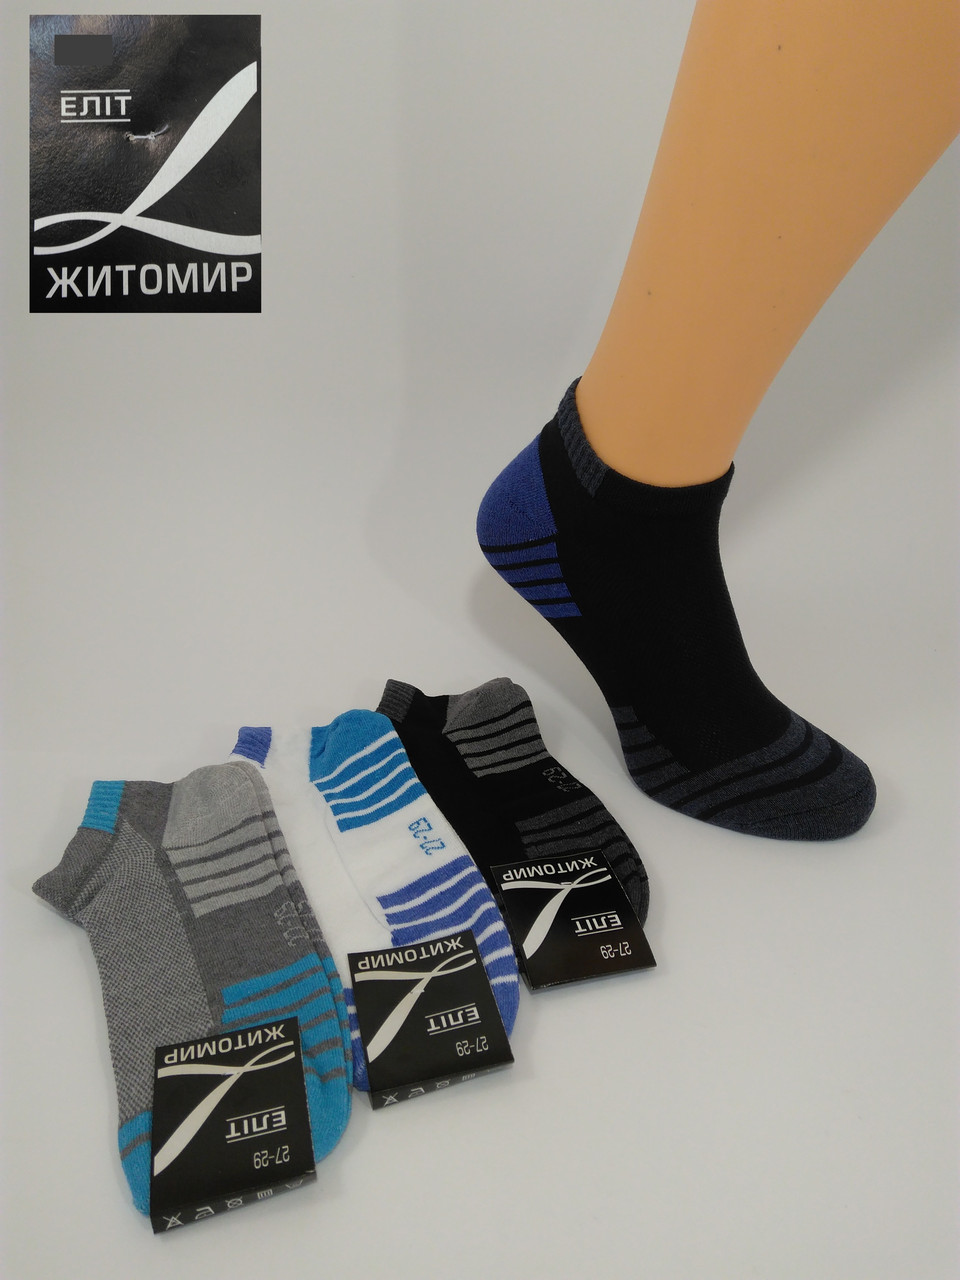 Мужские носки спорт сетка 27-29 (41-44ОБУВЬ)